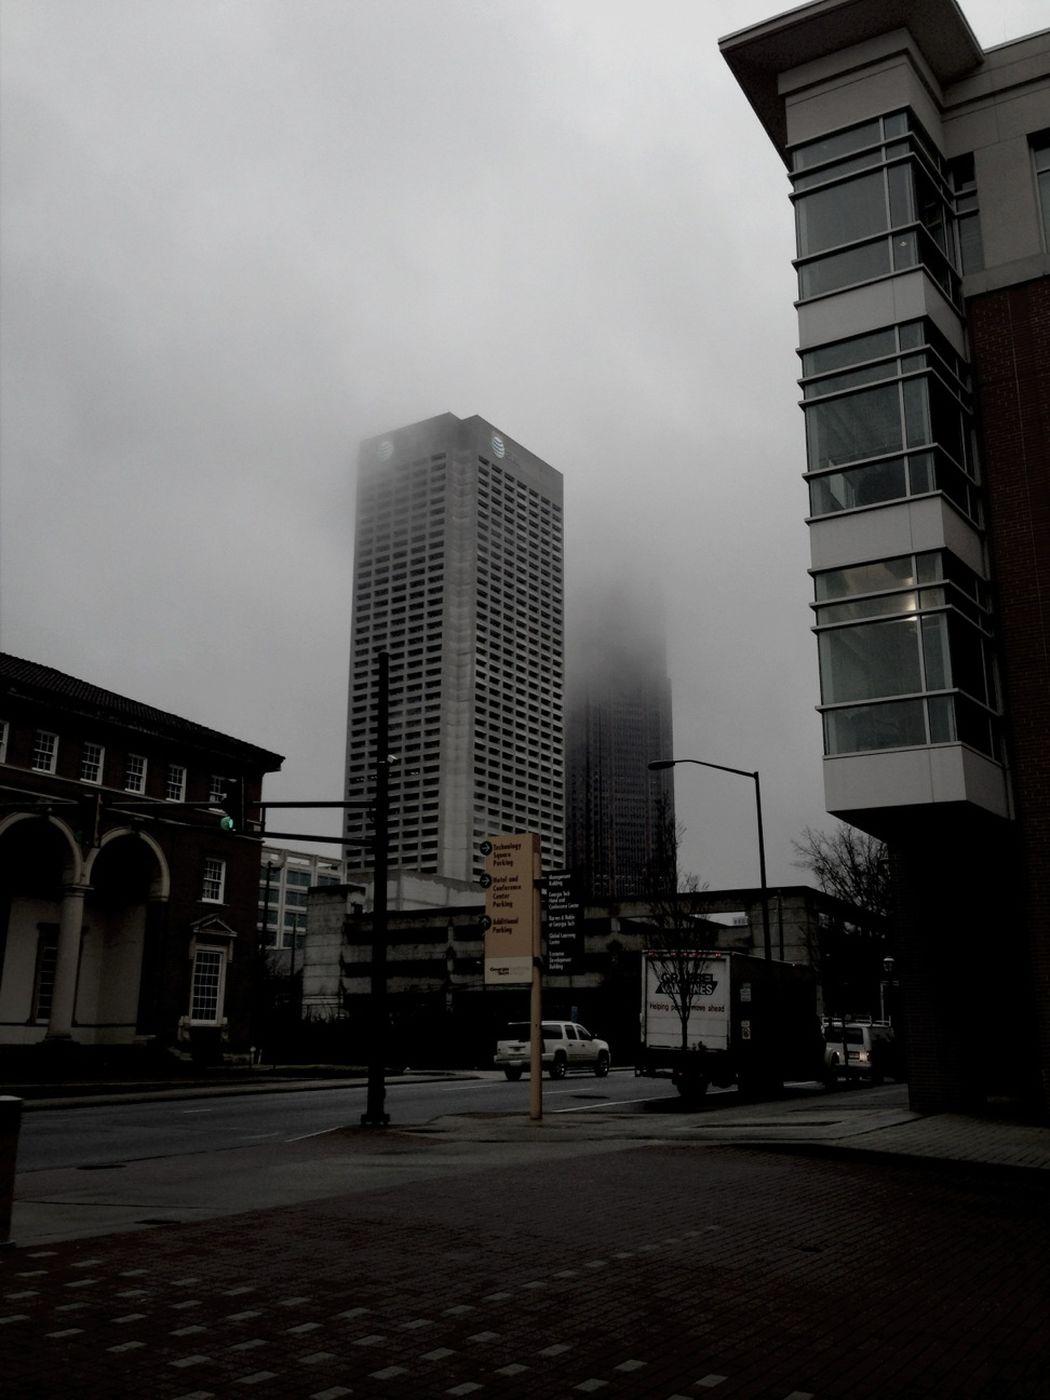 A foggy morning in Atlanta